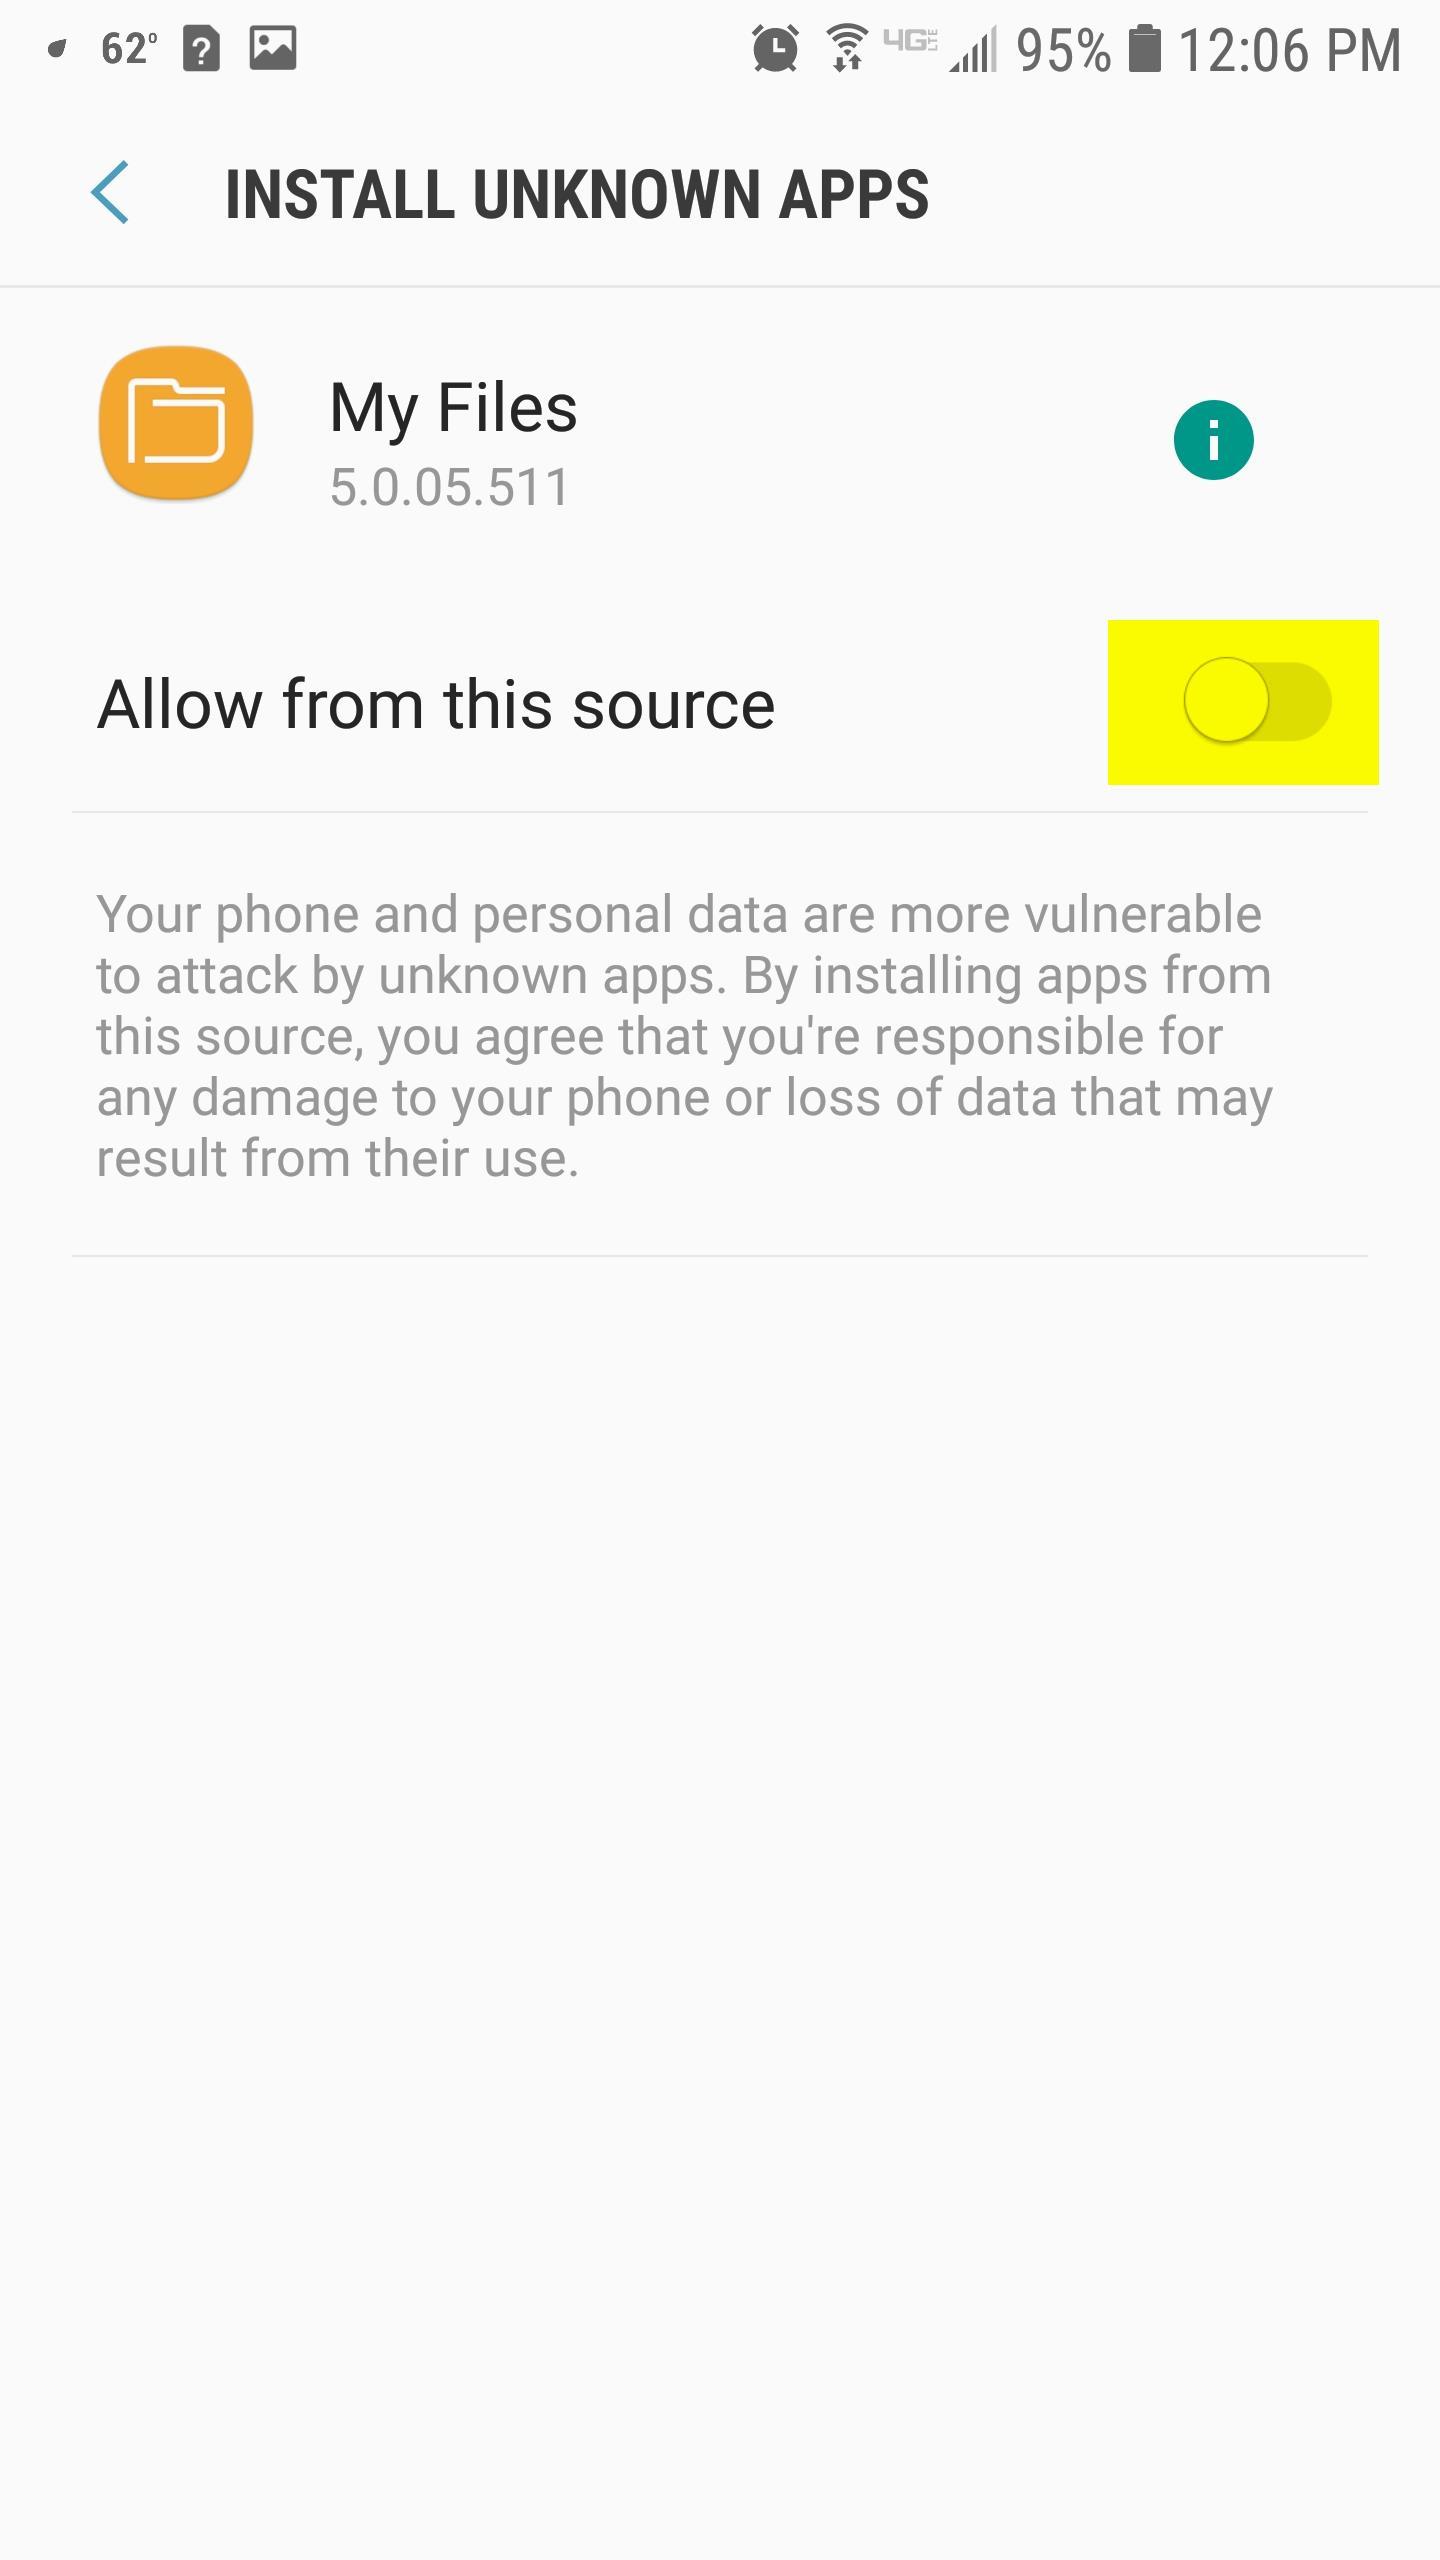 Samsung Activation via APK Download : Premium Support